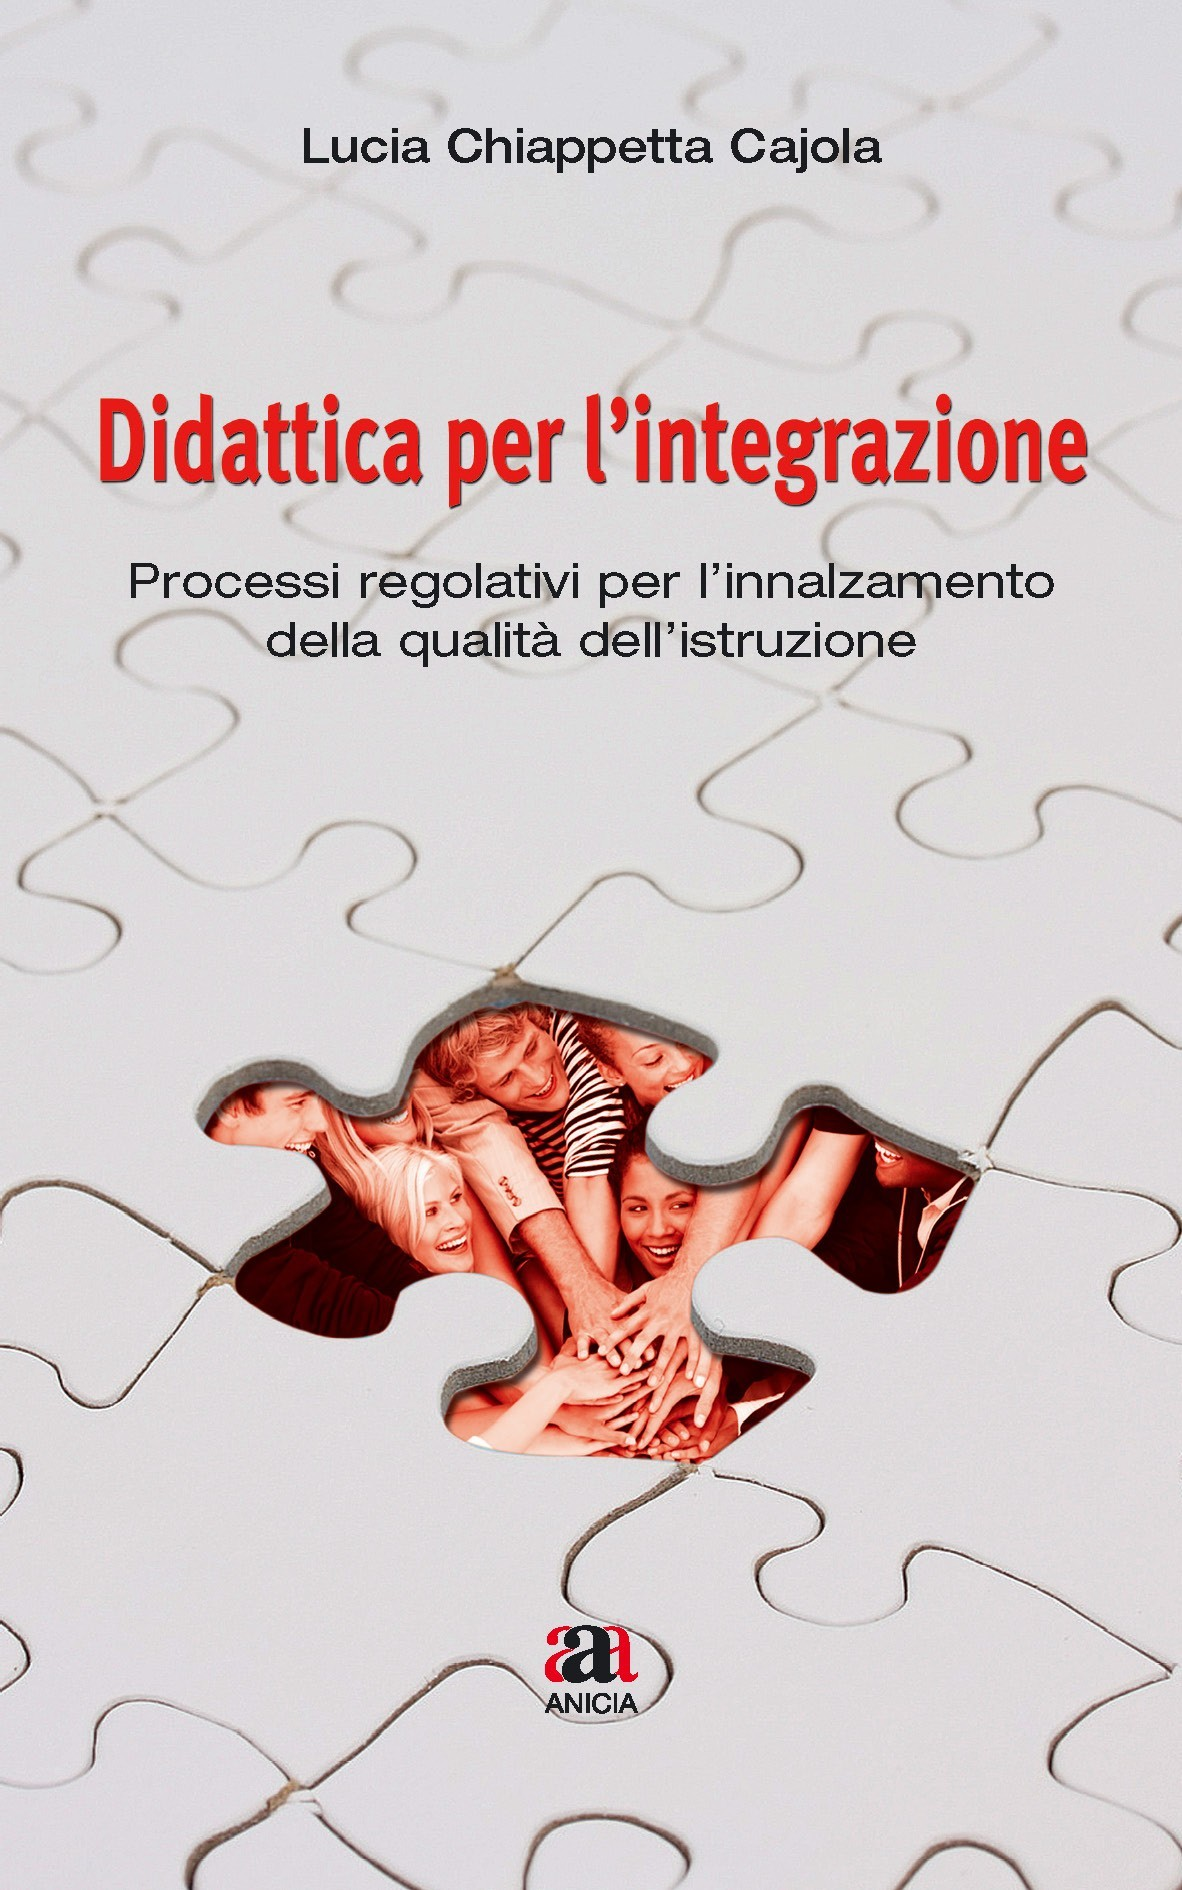 Didattica per l'integrazione